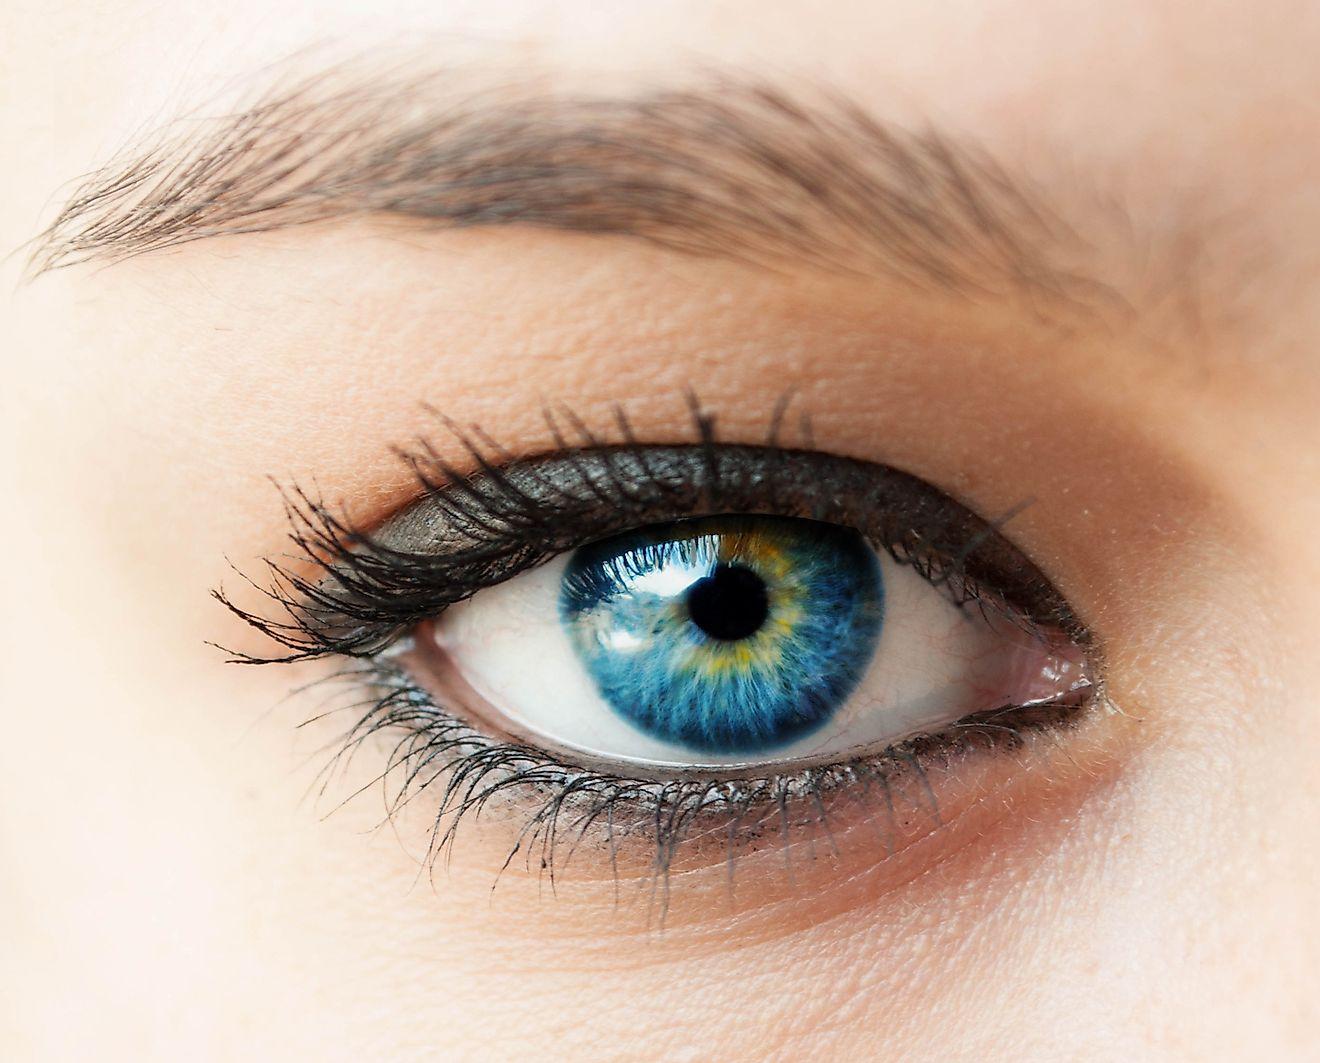 Dry Eye Testing & Treatment - Eyes & Optics of Pearland